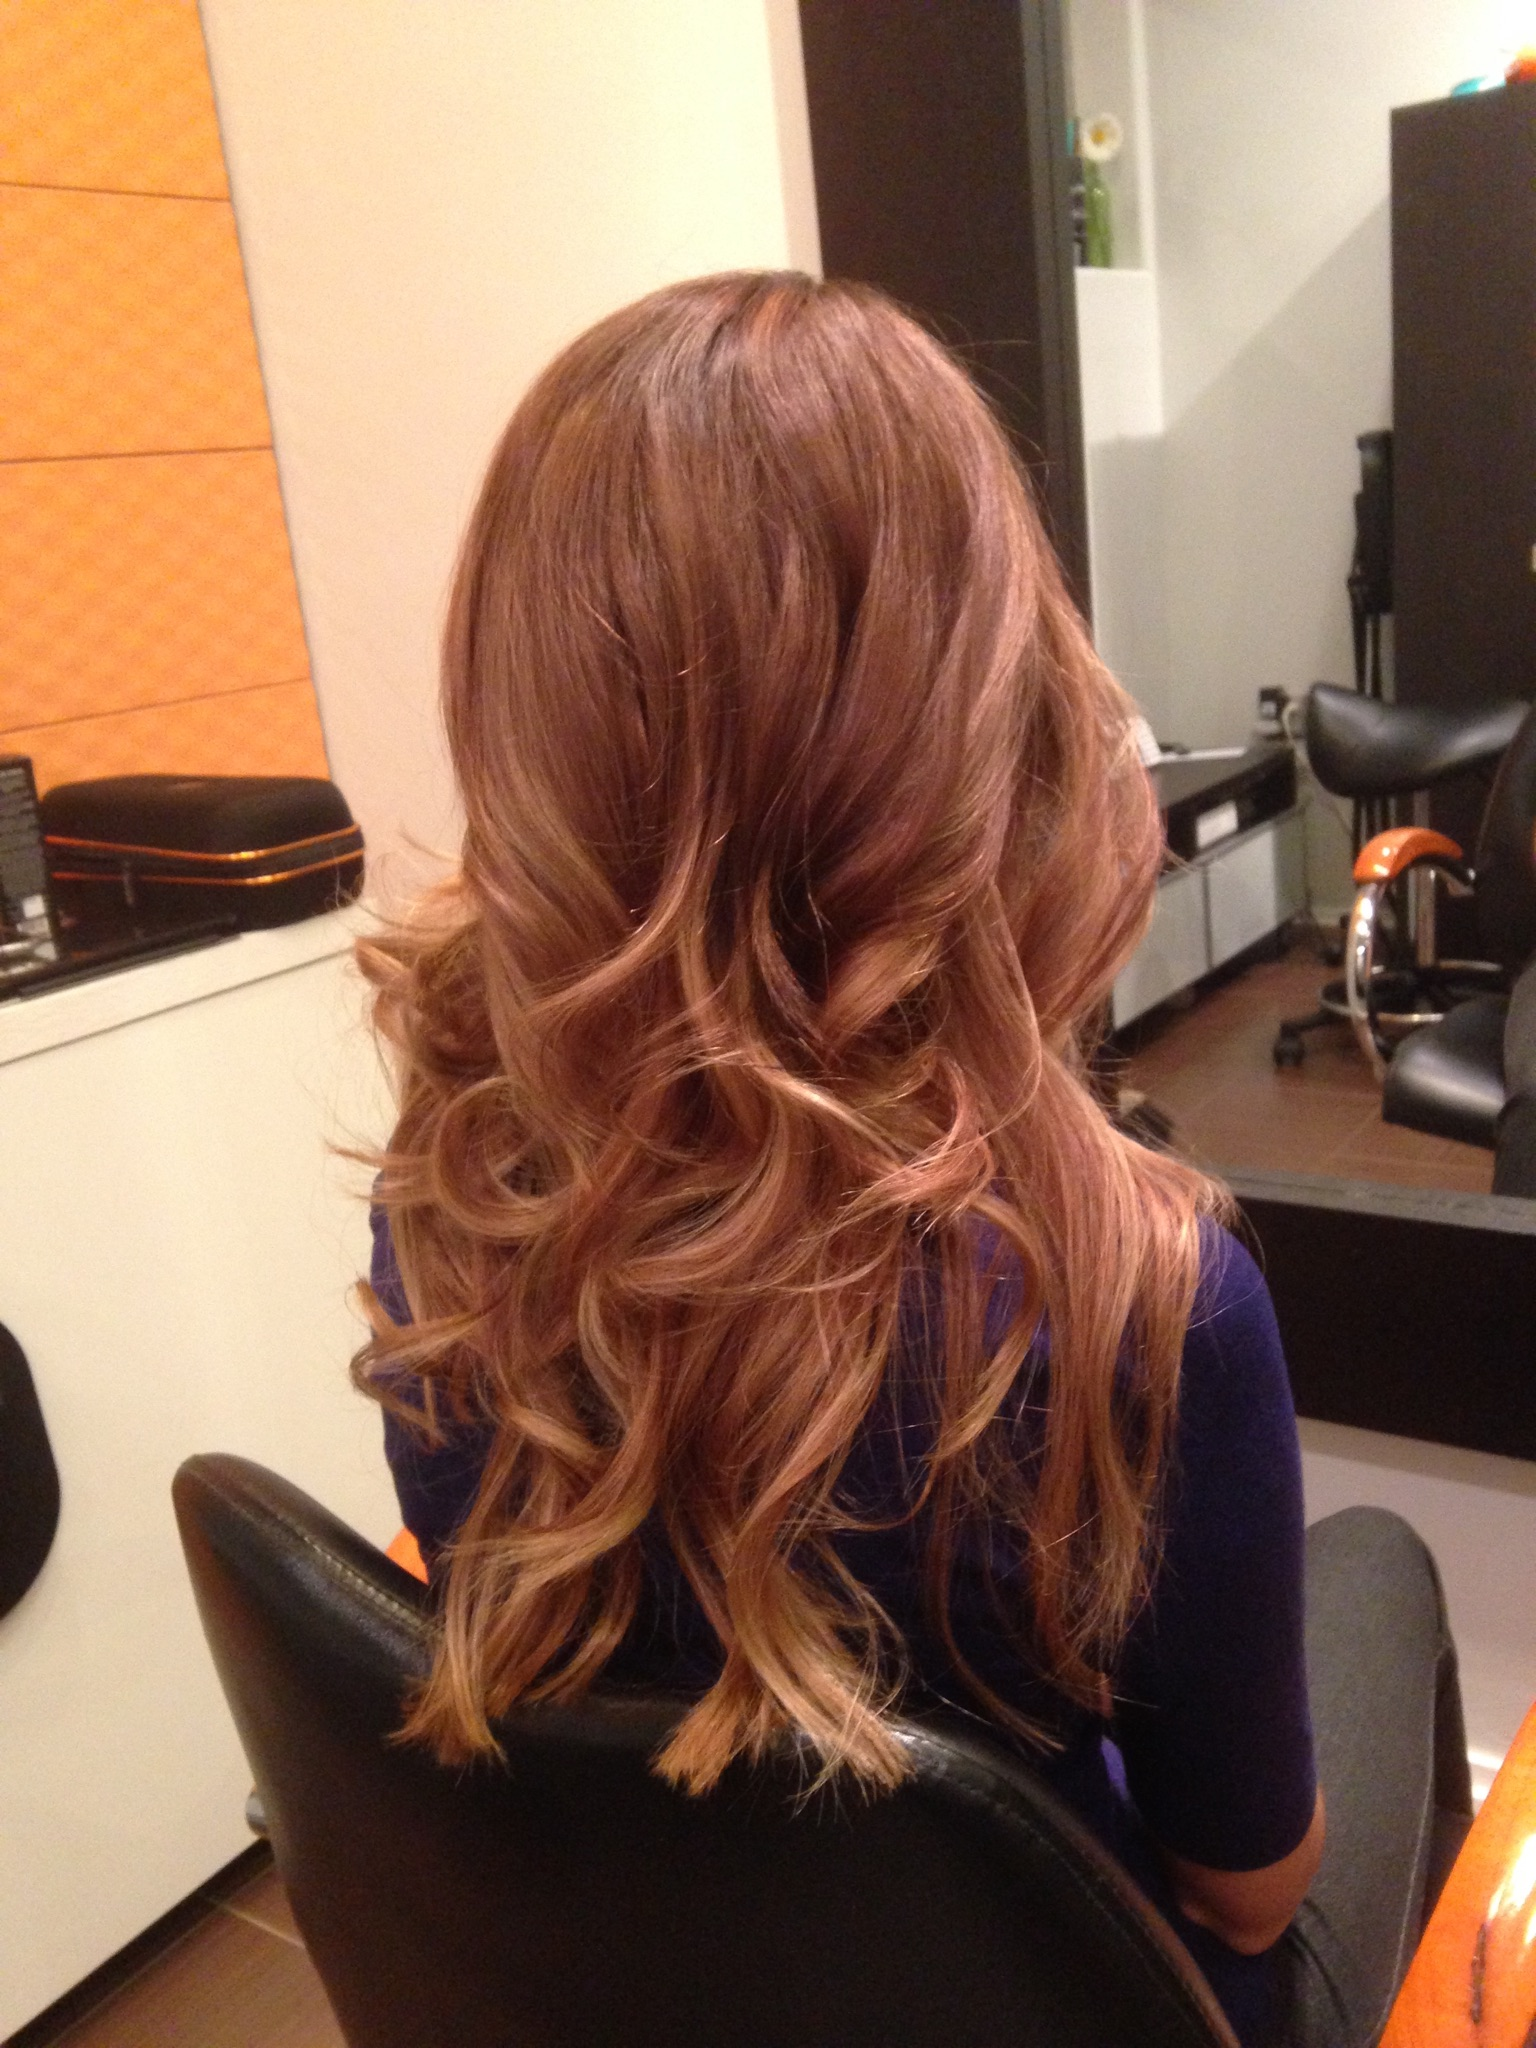 Gallery Deana Phelps Hair Designs